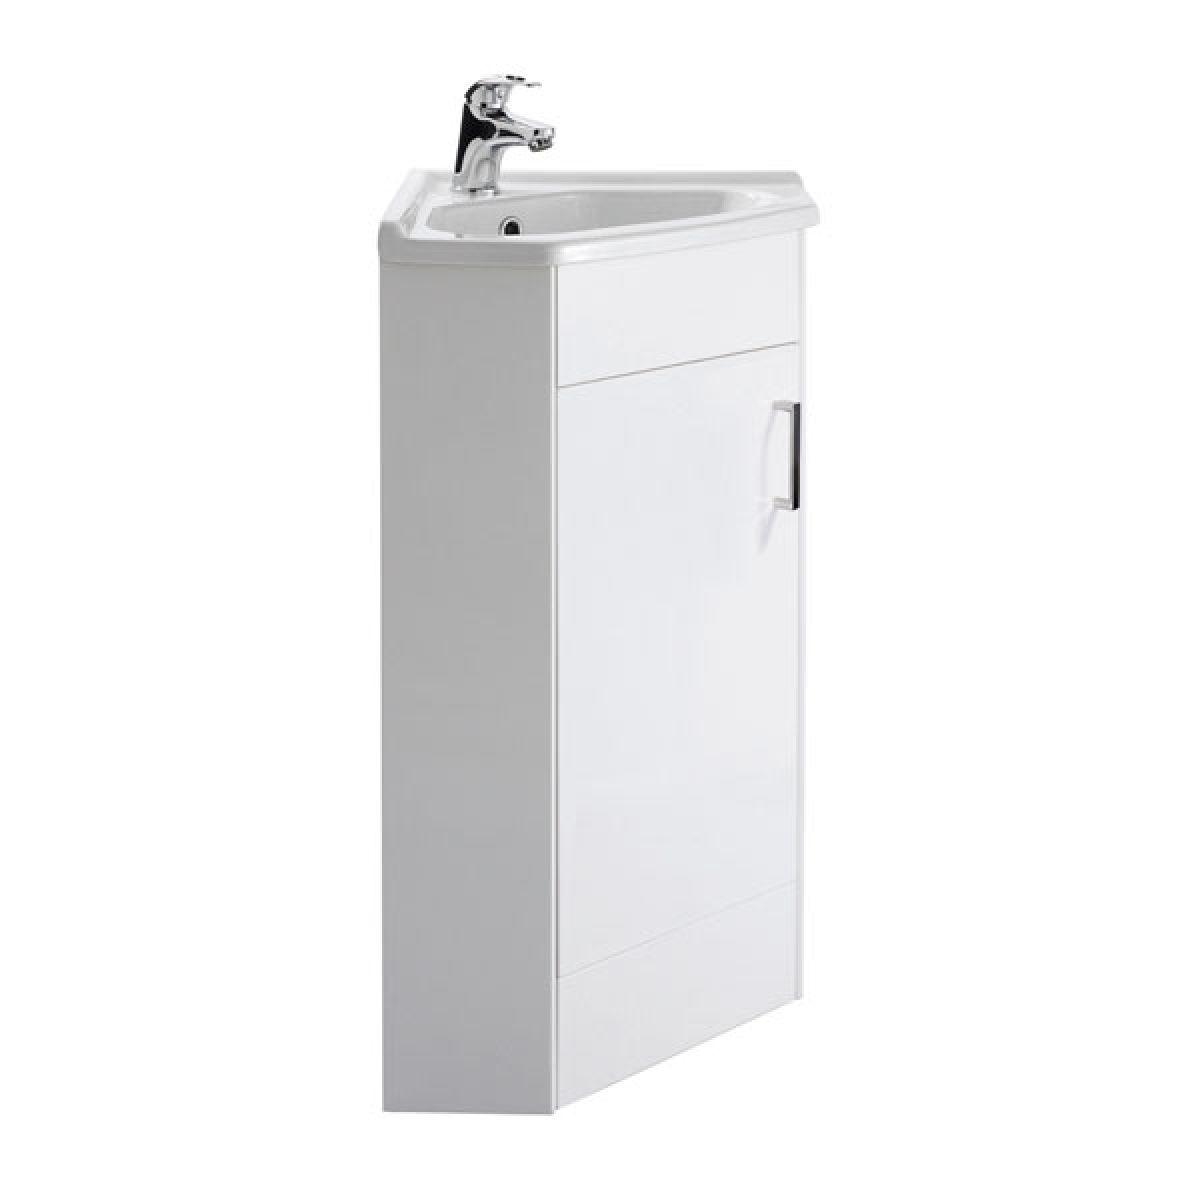 Premier High Gloss White Single Door Corner Vanity Unit